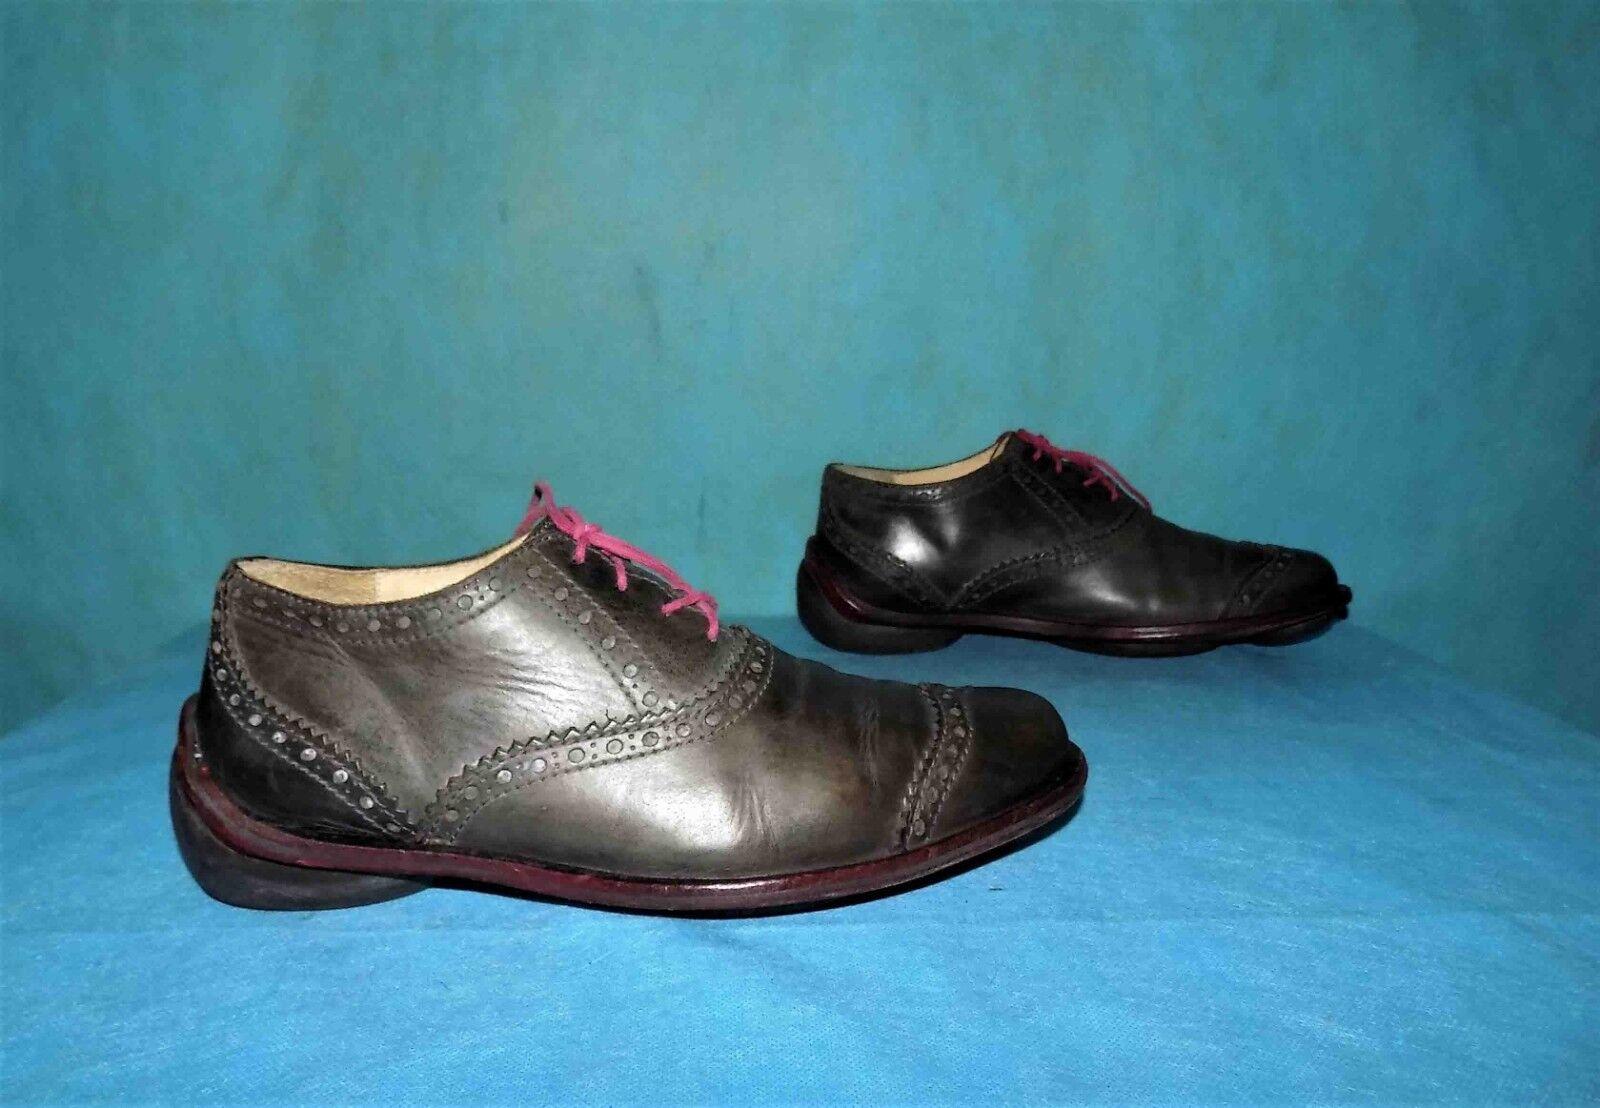 Chaussures a lacets MARITHE marron FRANOIS GIRBAUD tout cuir marron MARITHE vieilli p 41 fr 1c773b